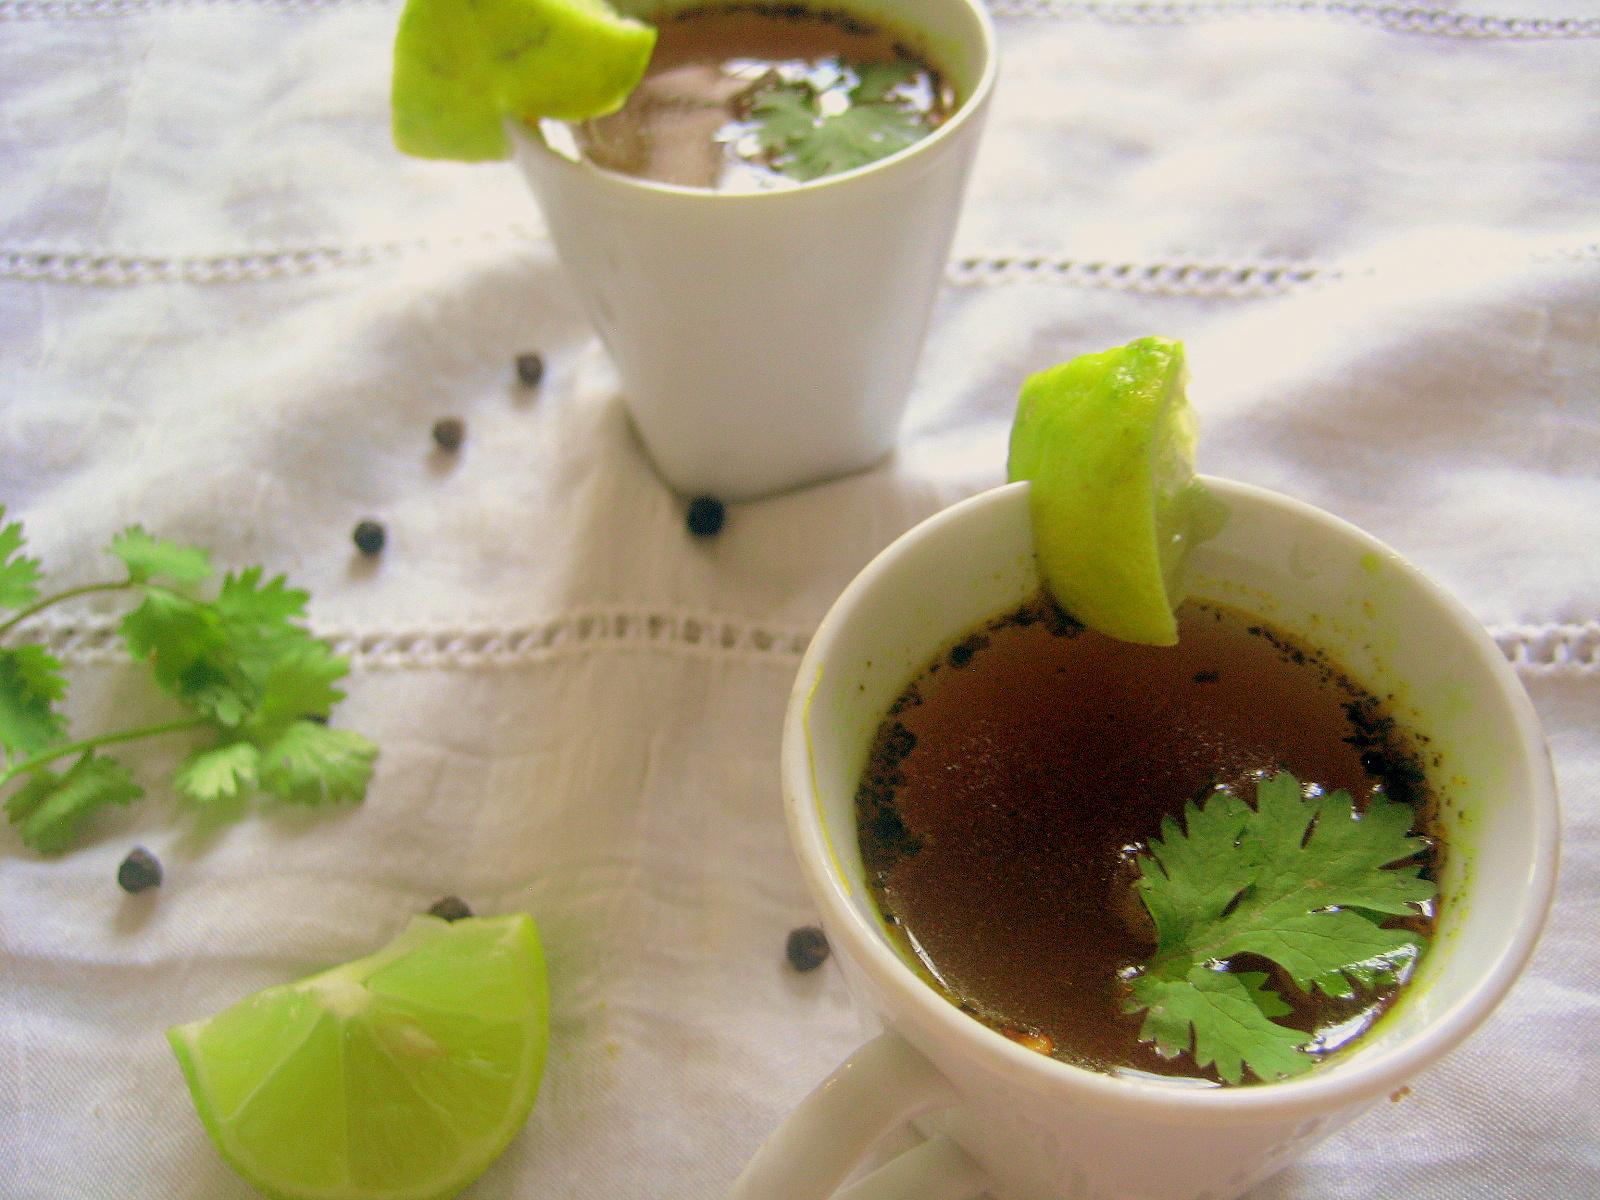 madhuri's kitchen: Lemon Rasam / Lemon Soup / Nimmakaya ...